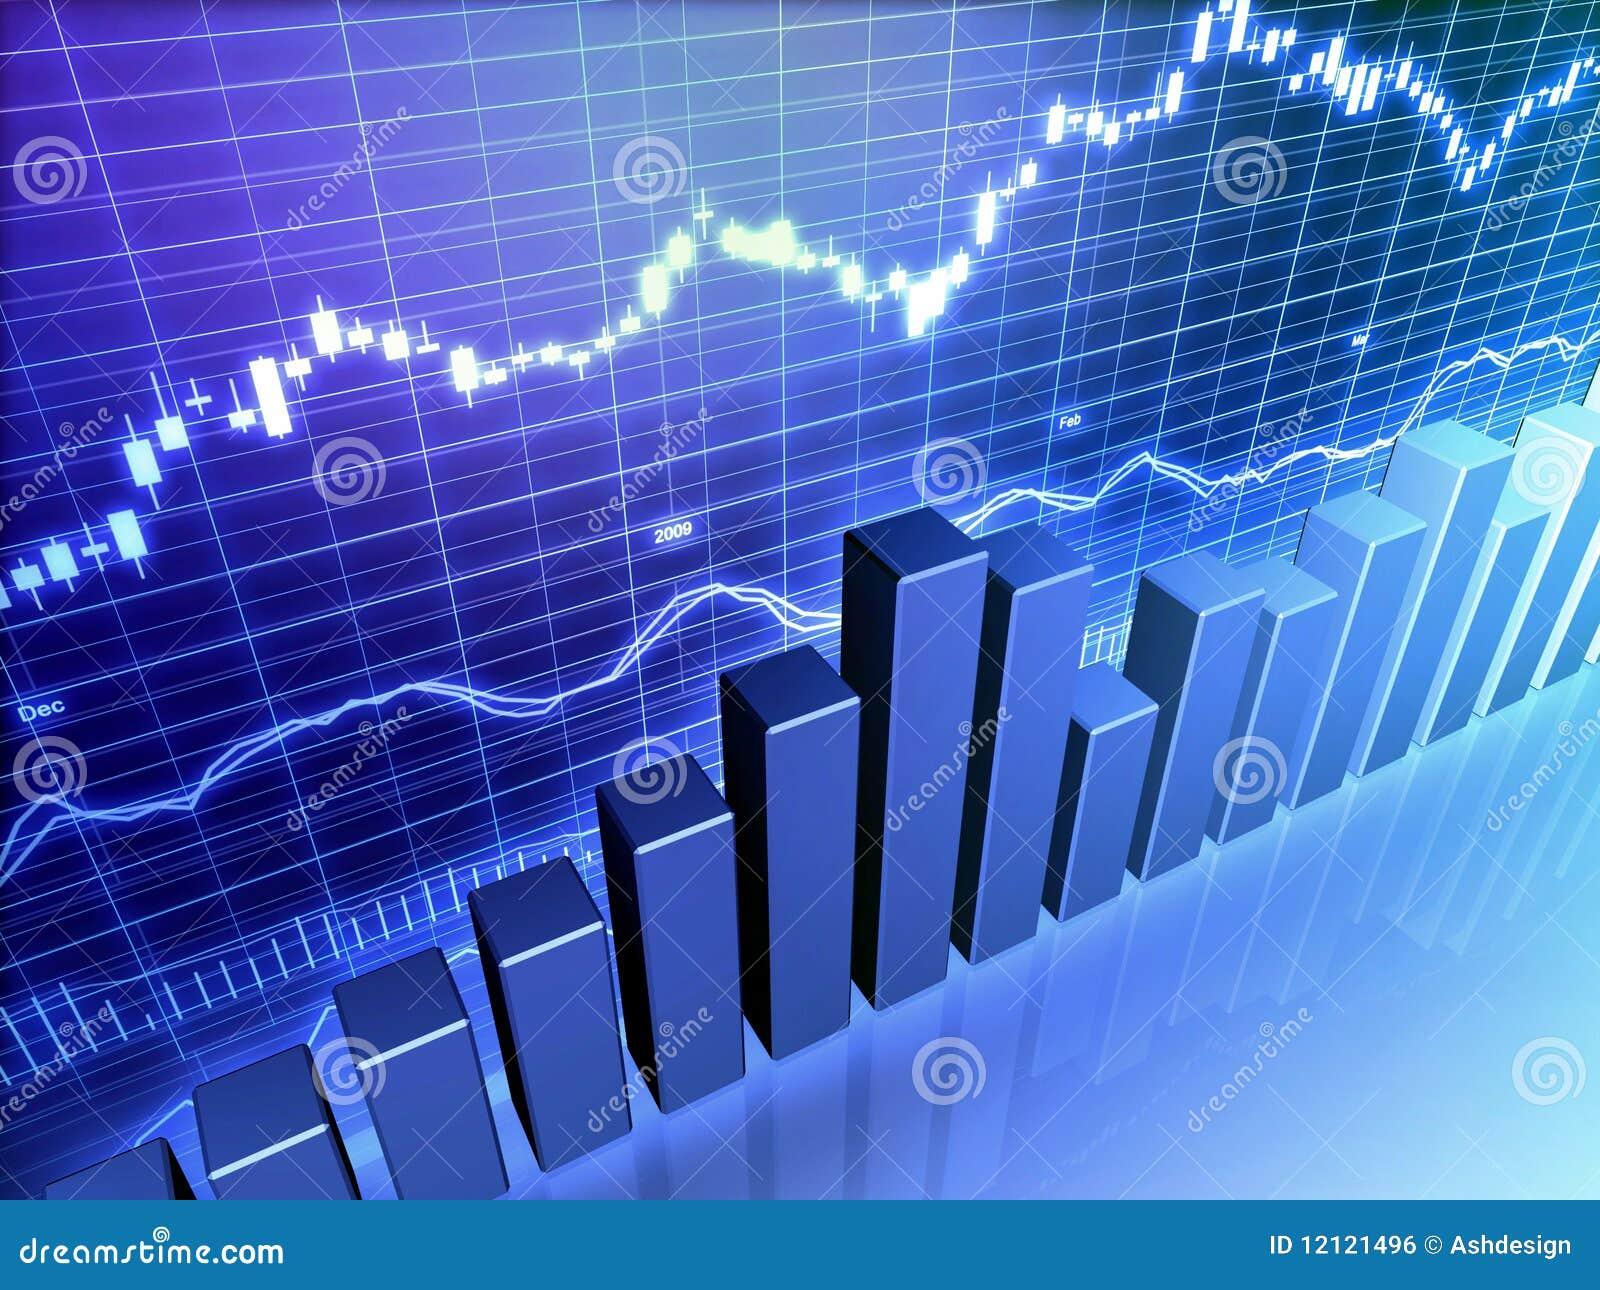 Digital currency chart